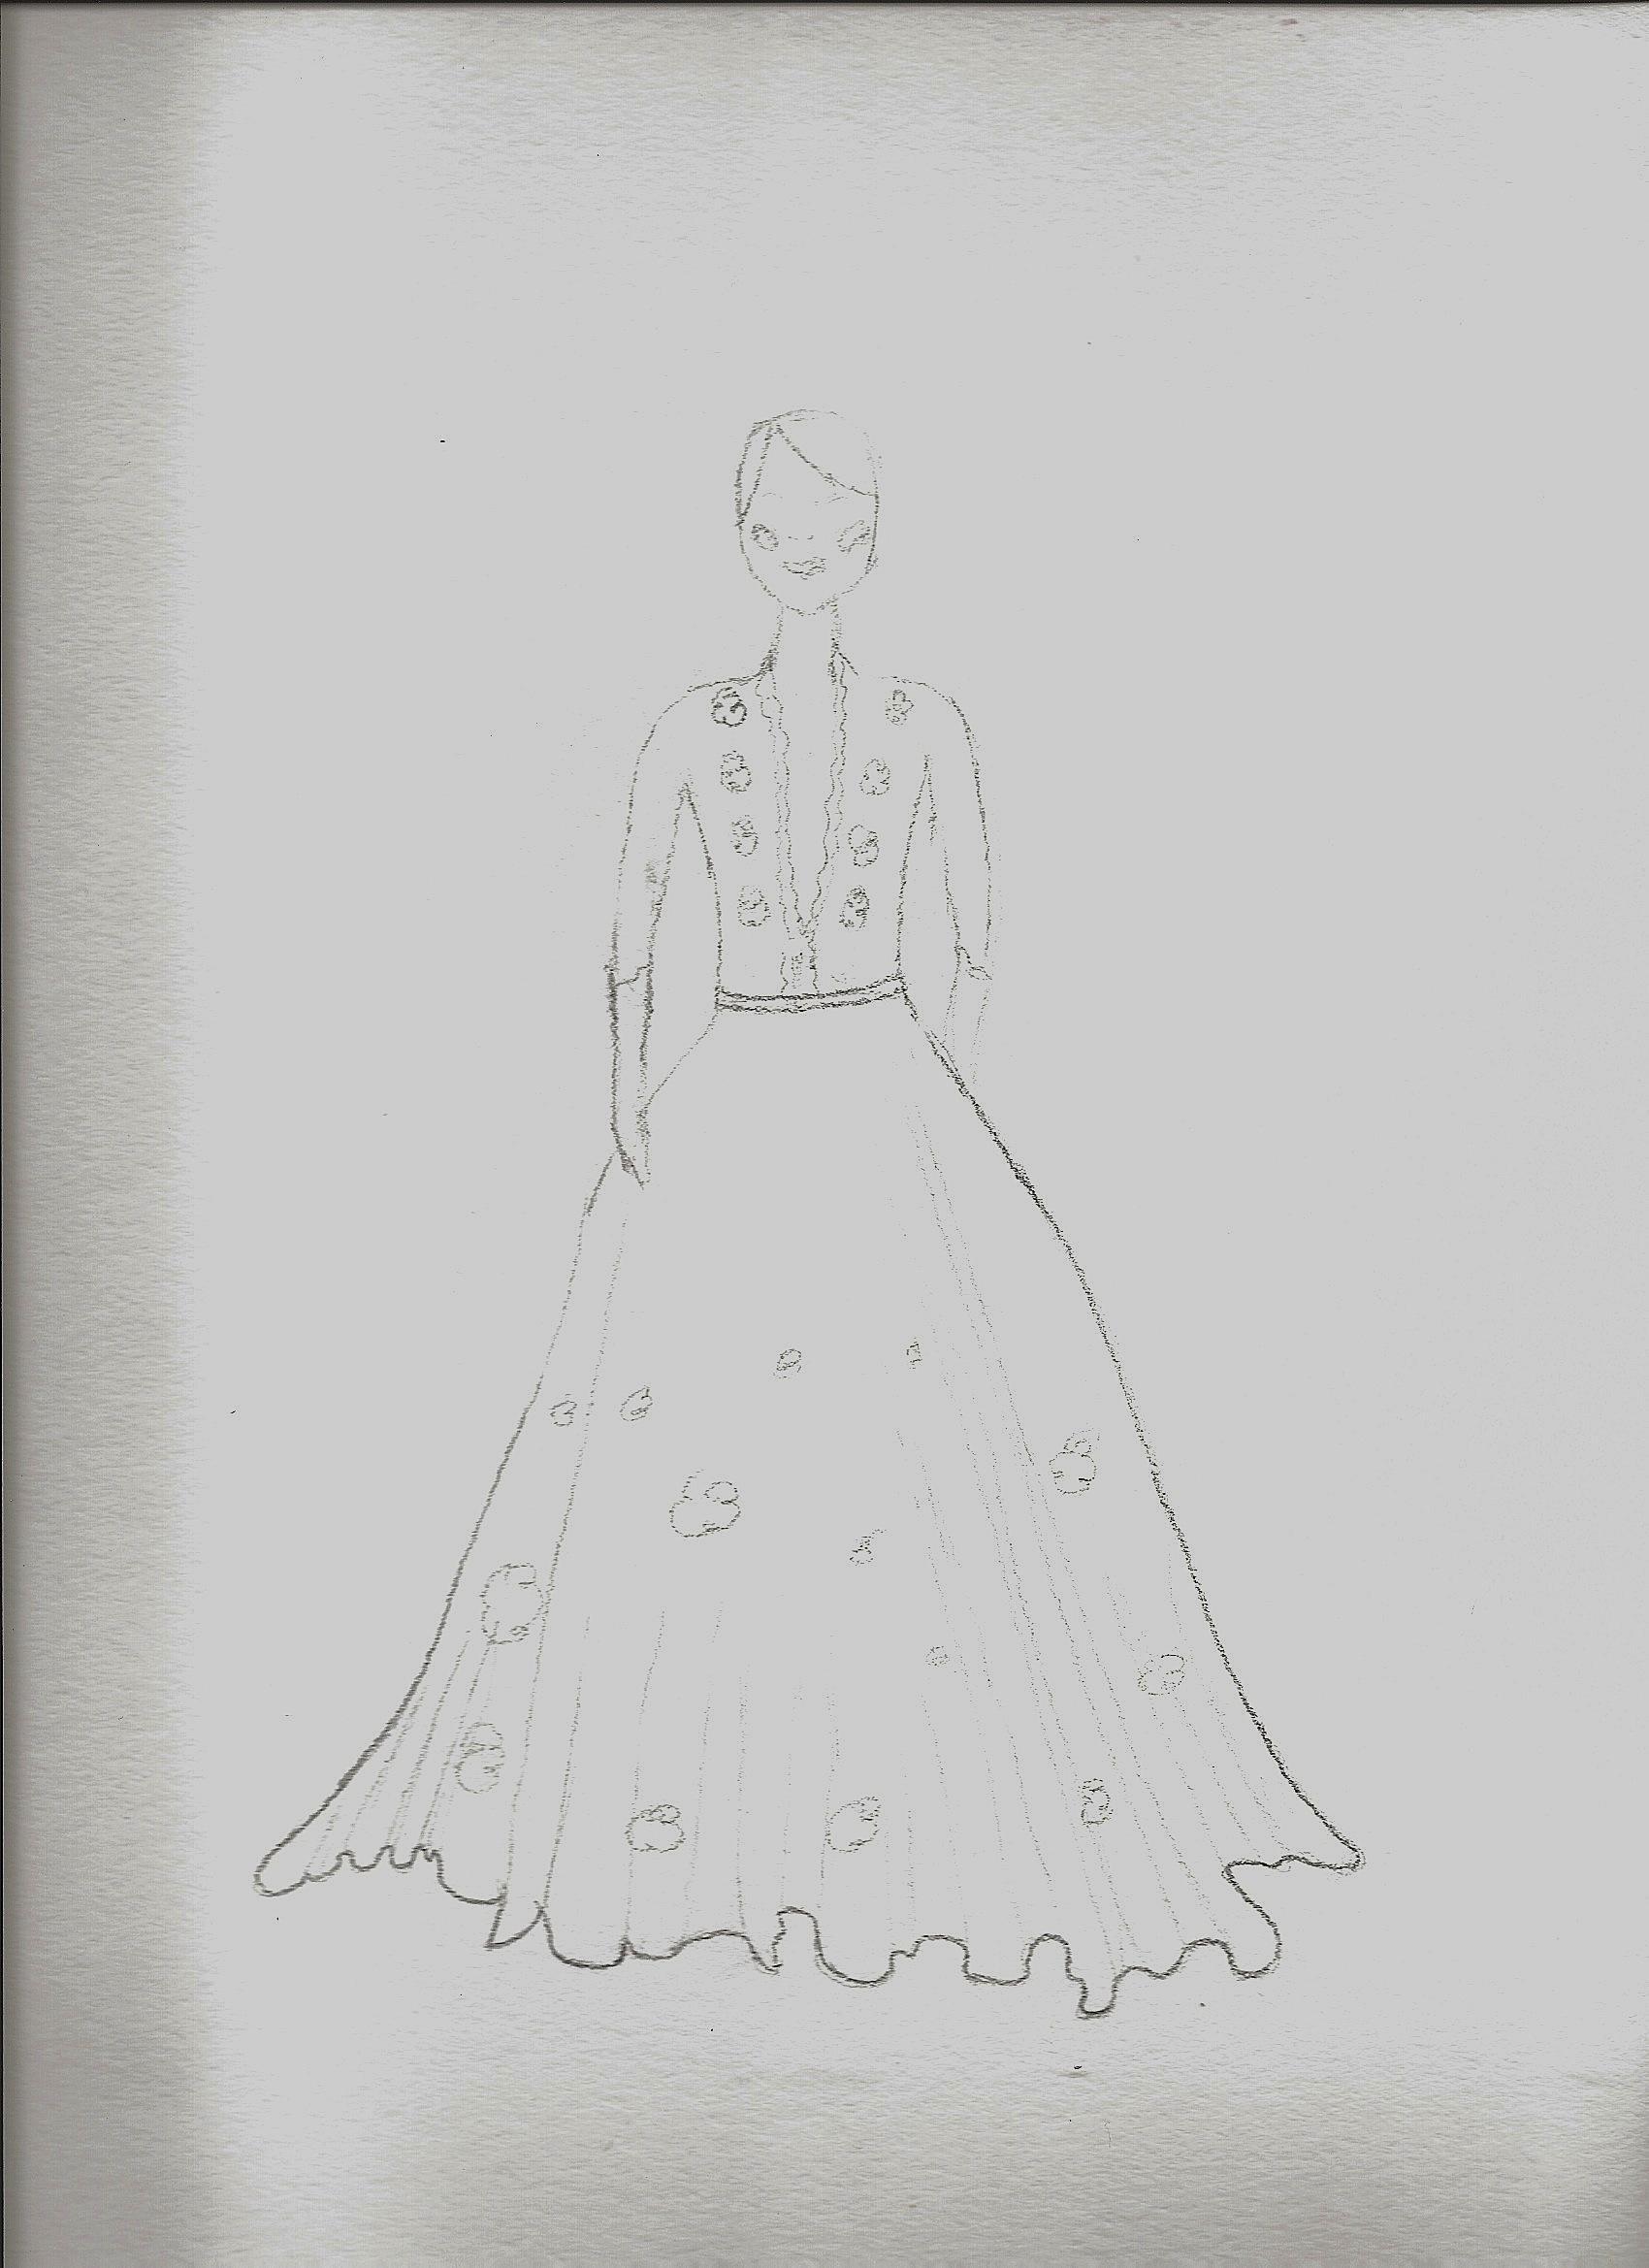 SKETCH - Vintage Romance  - image 1 - student project